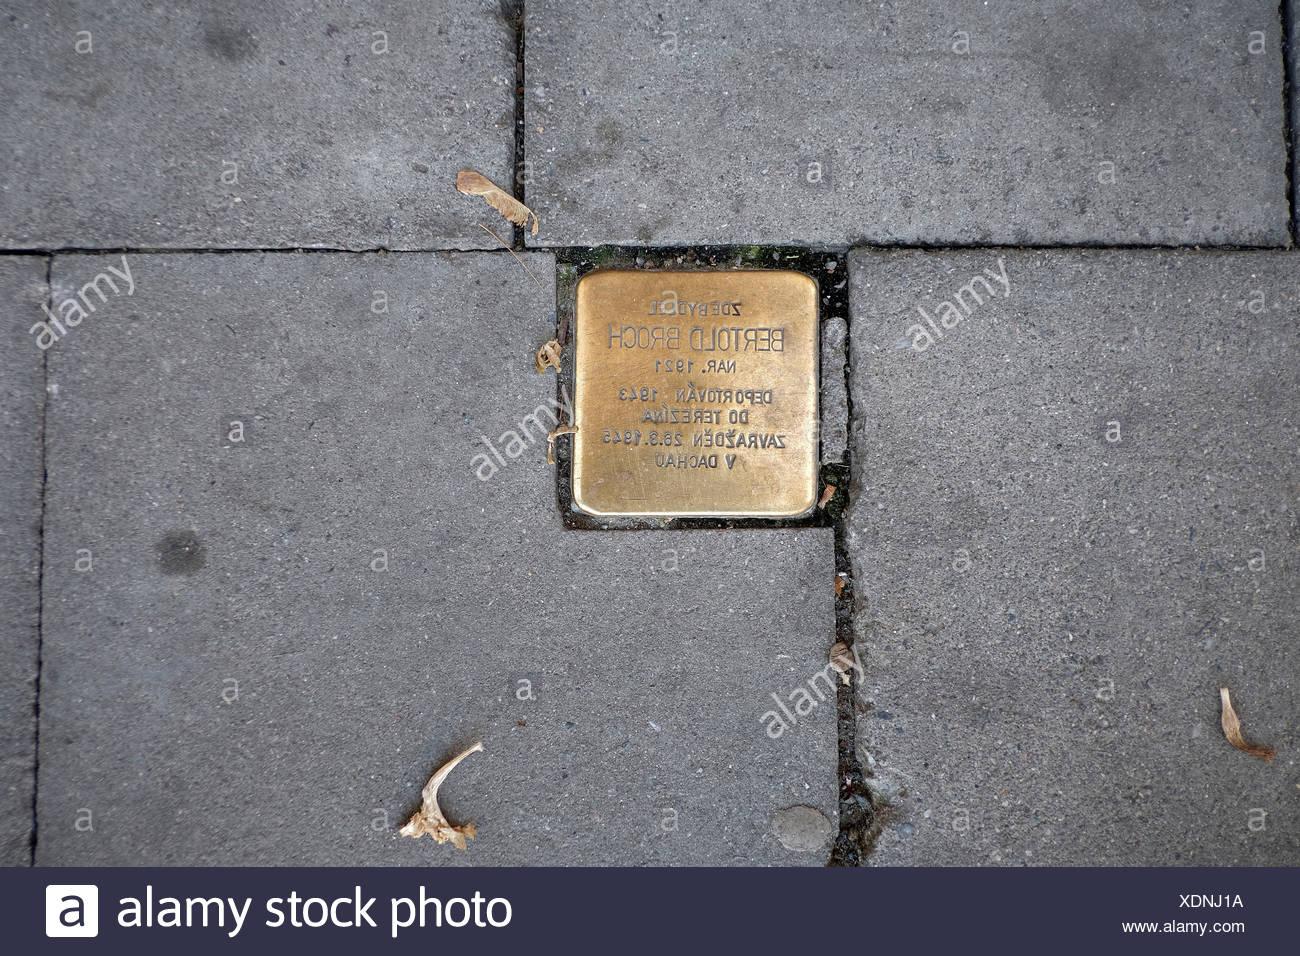 Europe, Czech Republic, Olomouc, Olmütz, pavement, golden commemorative stone - Stock Image